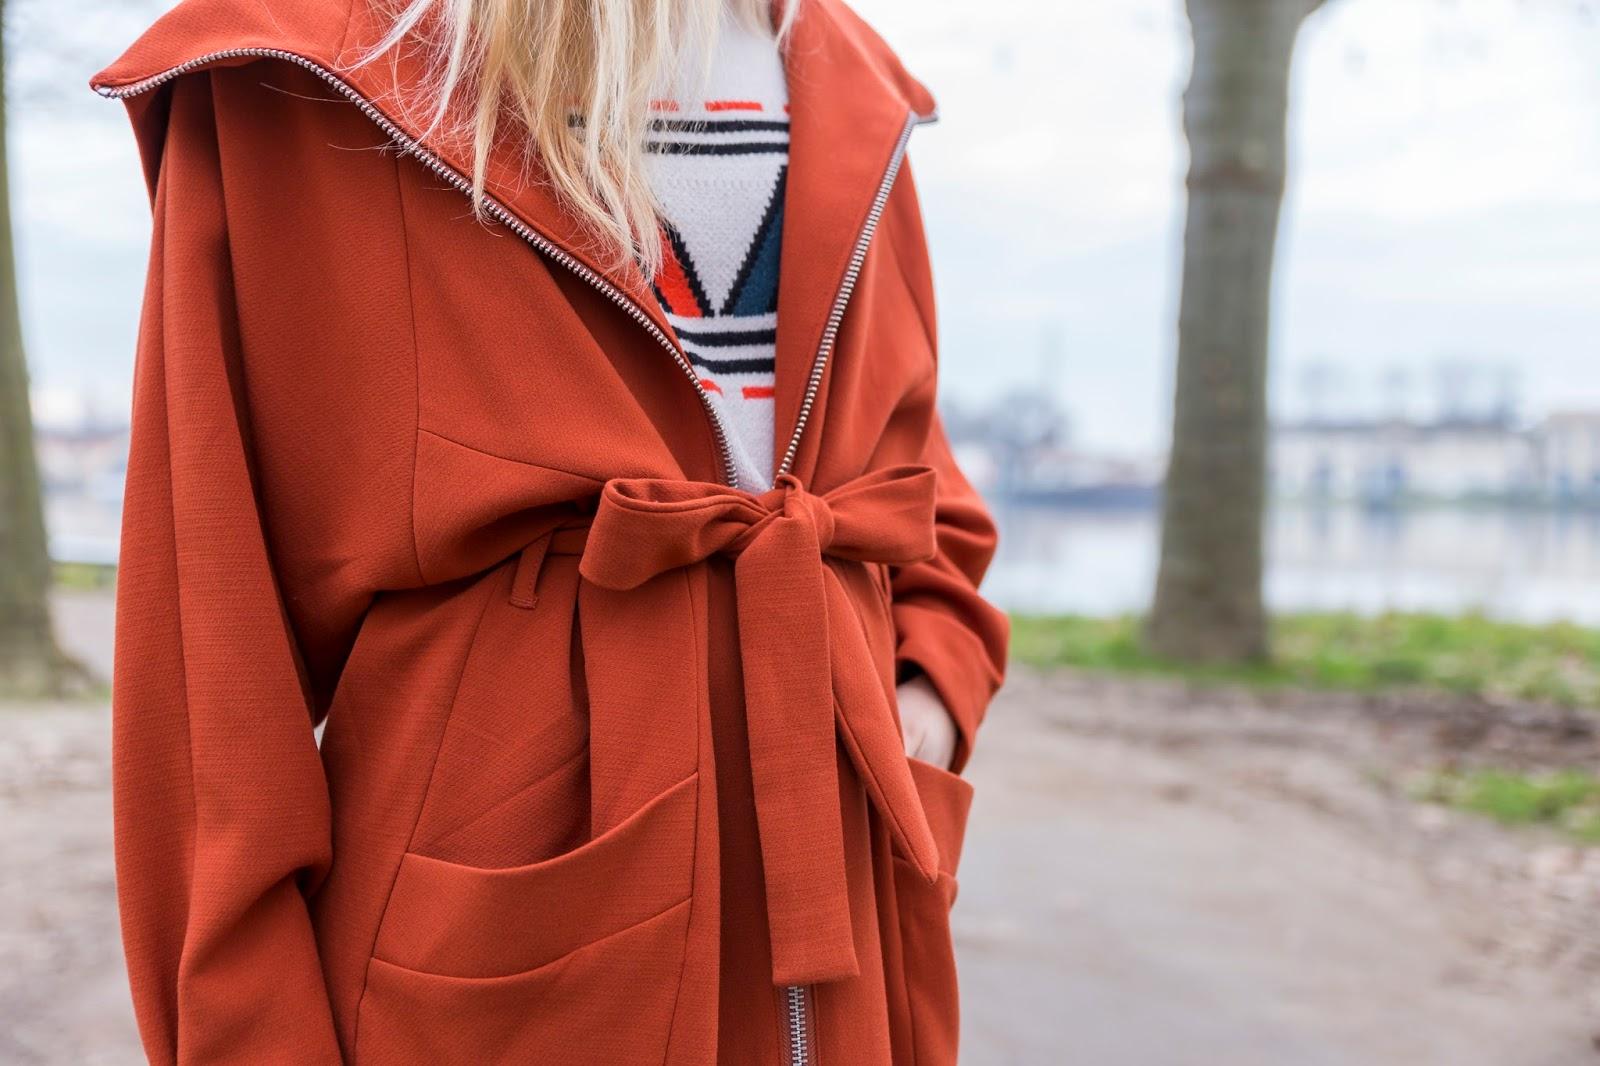 manteau orange ceinturé